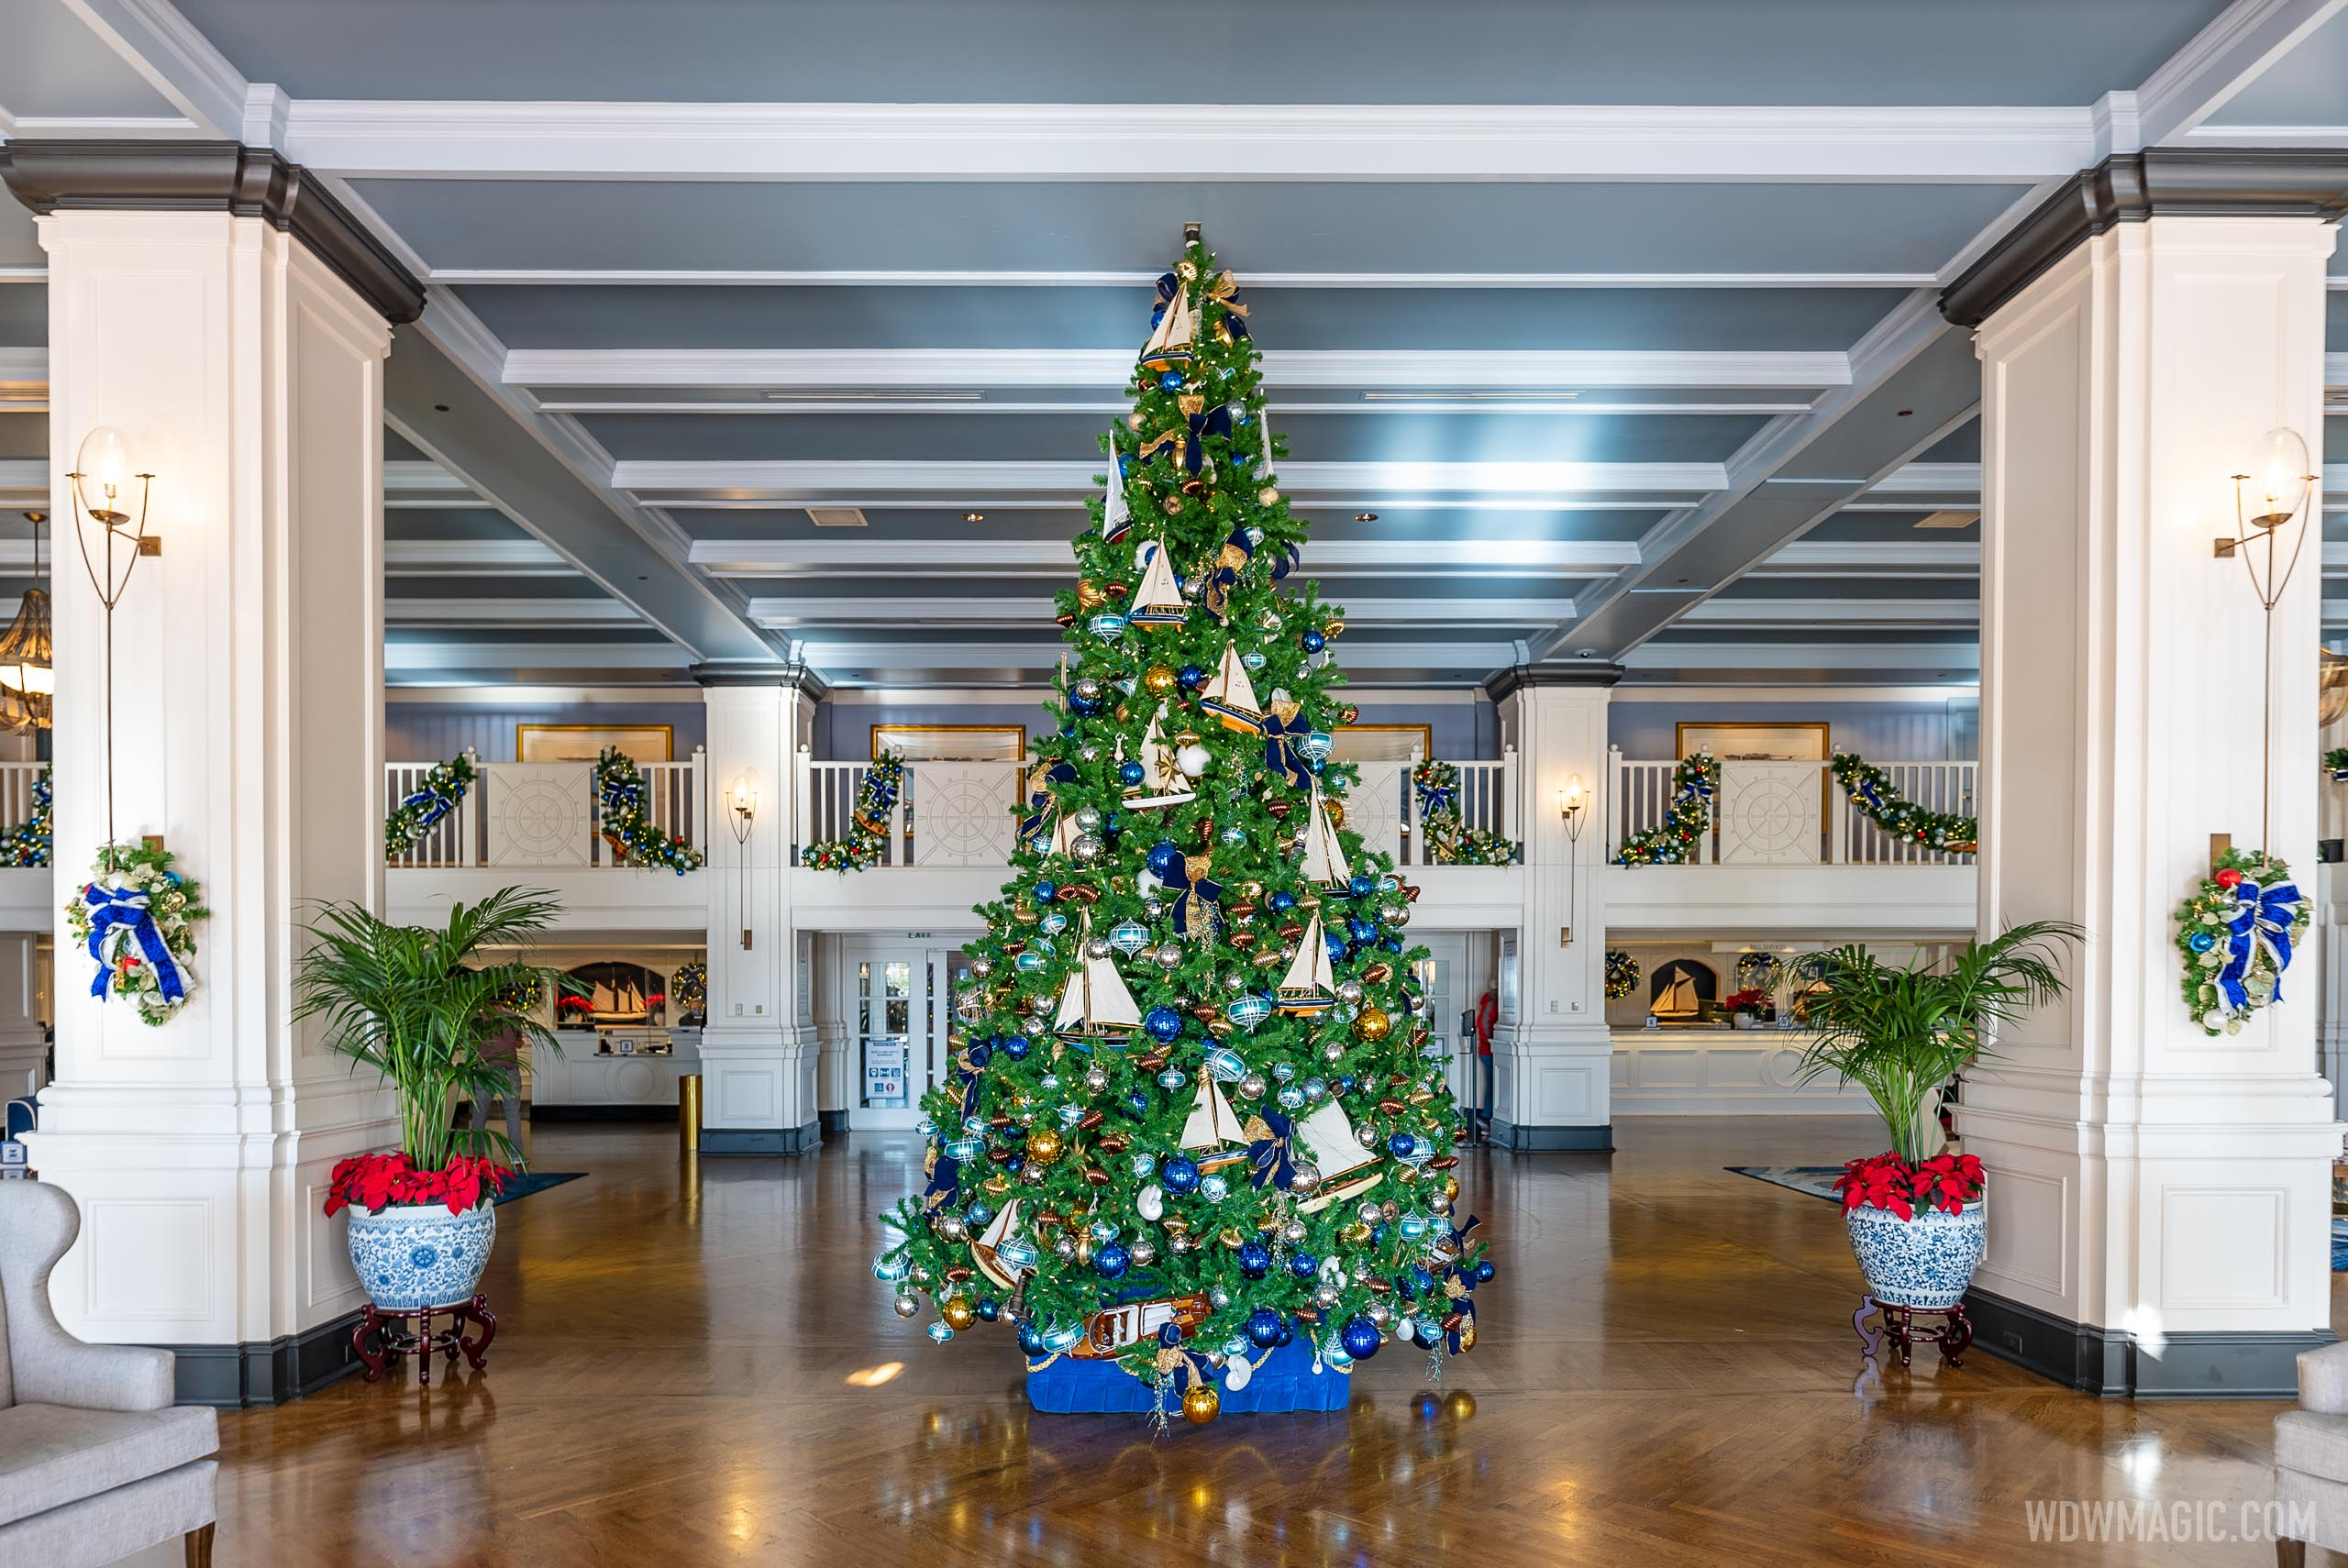 Yacht Club Resort Christmas Holiday decor 2020